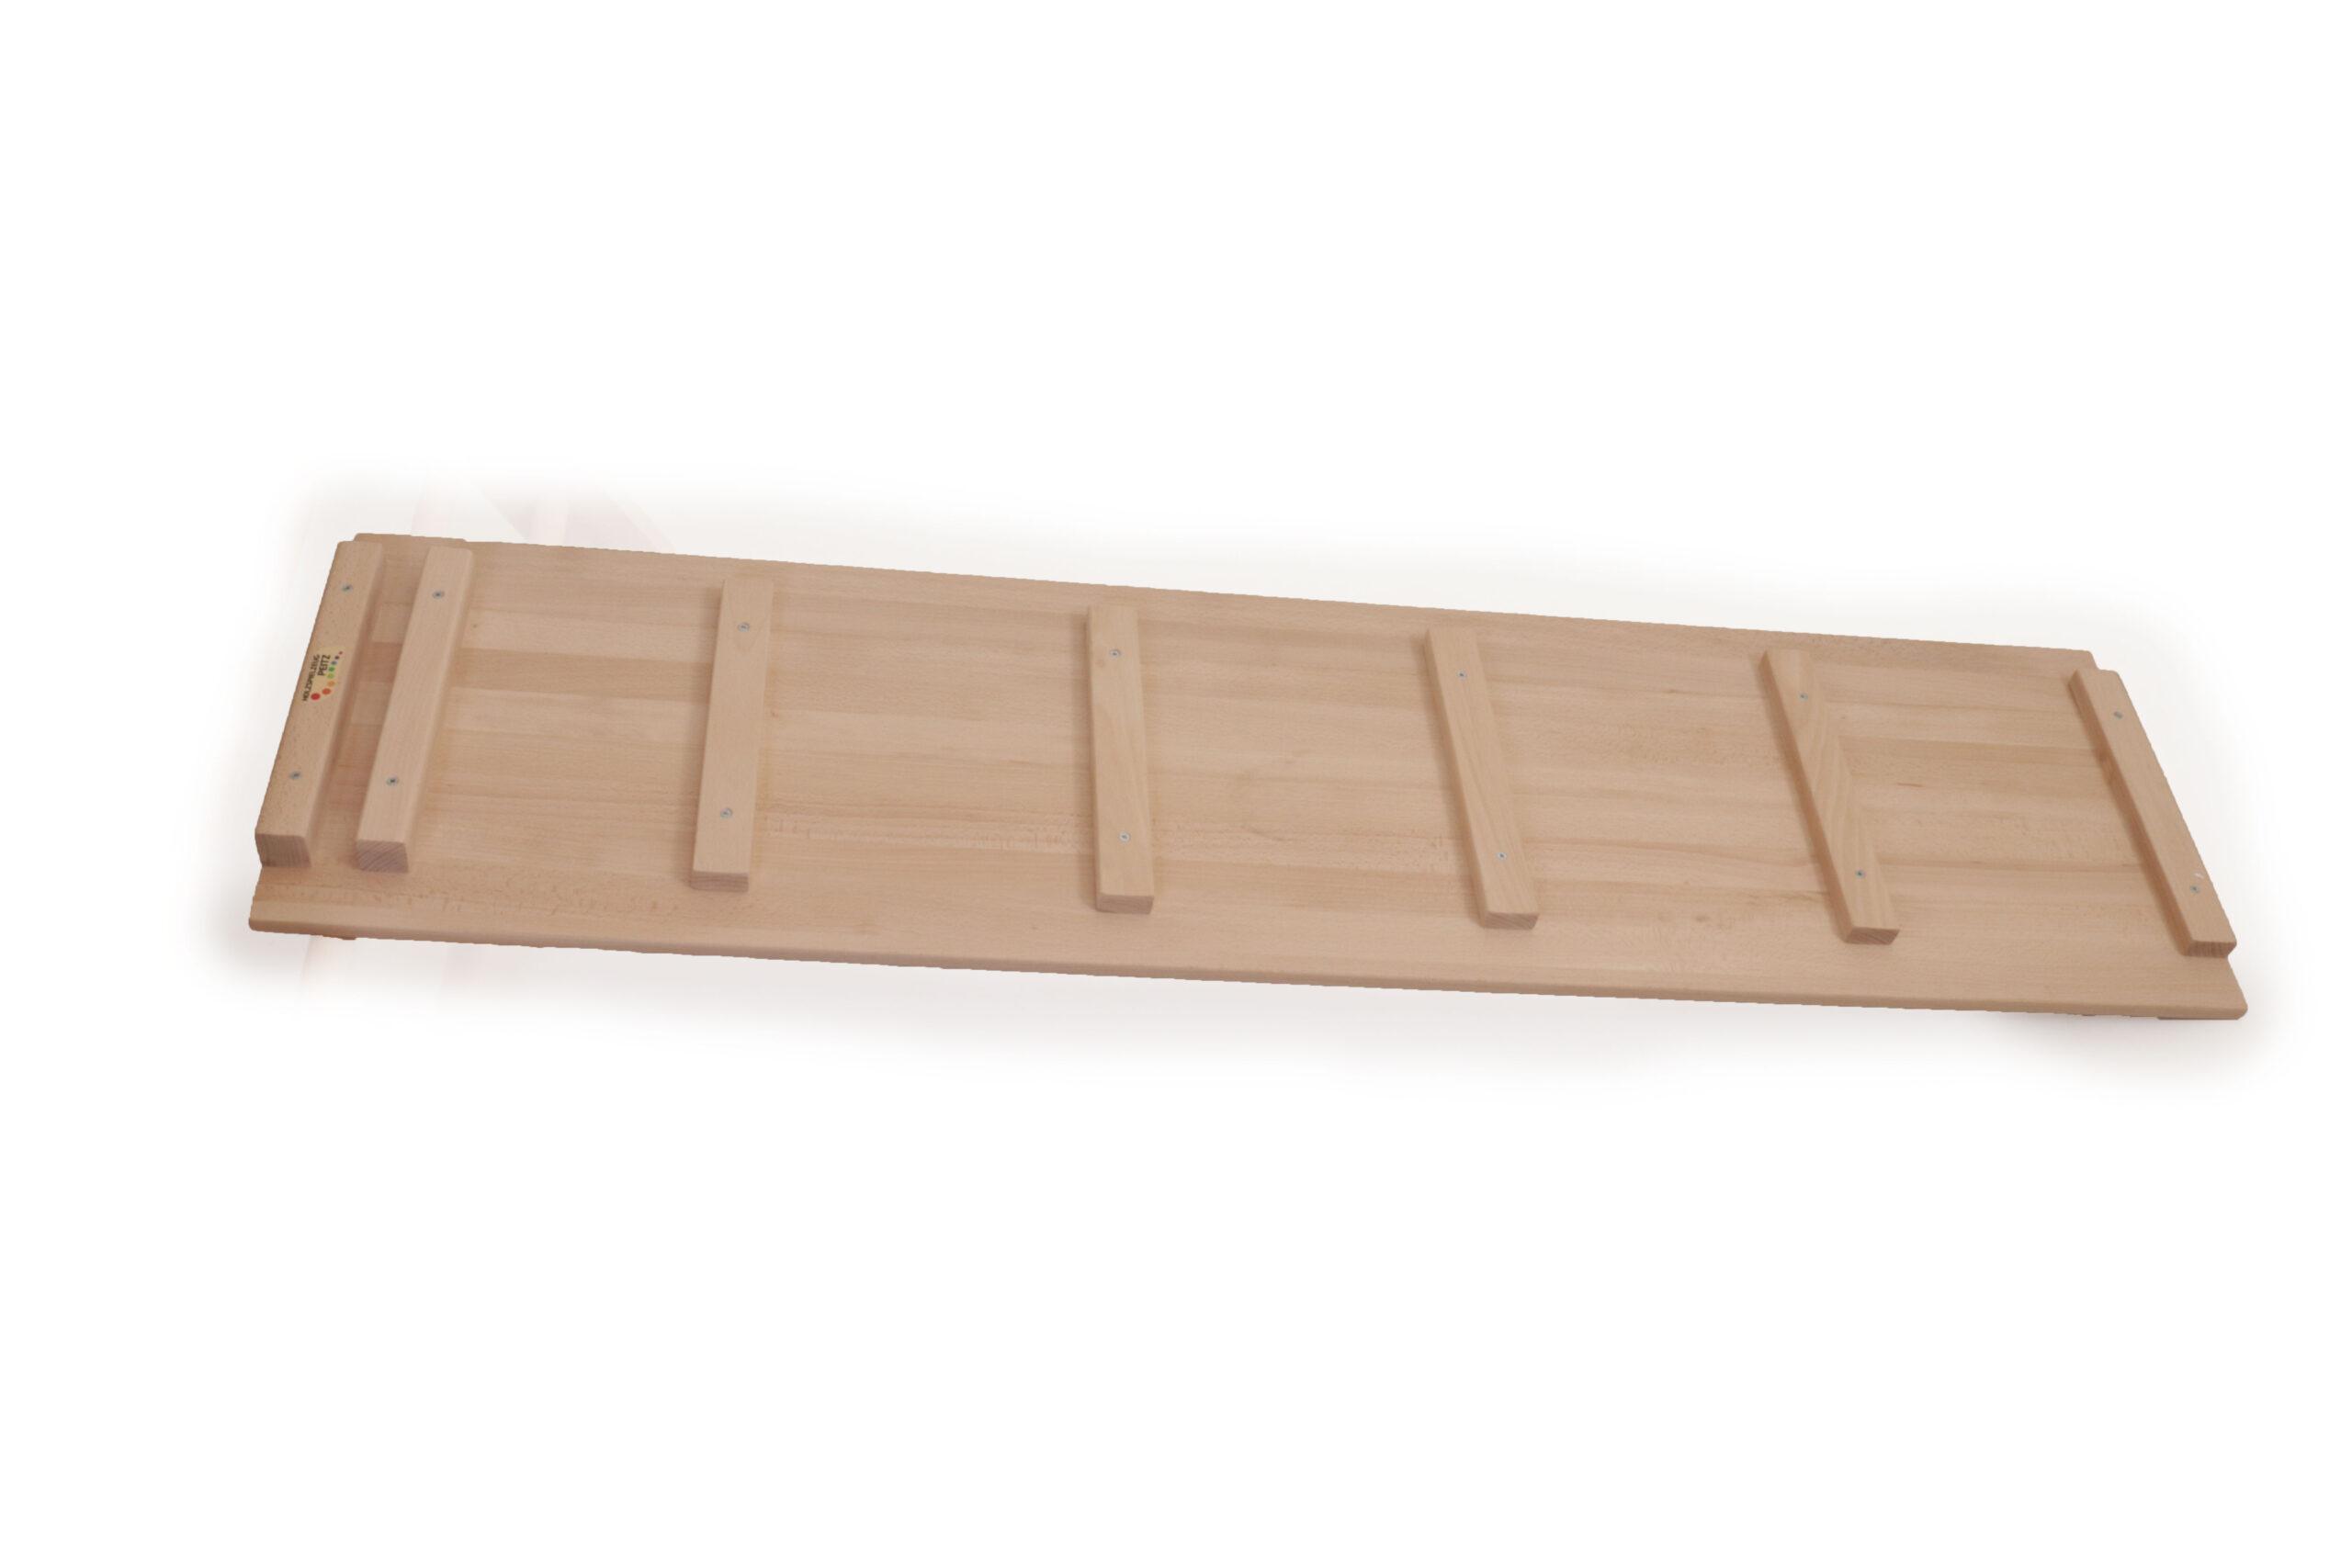 Full Size of Sprossenwand Kinderzimmer Hhnerleiter Aktiv Spielgert Holz Spielzeug Peitz Sofa Regale Regal Weiß Kinderzimmer Sprossenwand Kinderzimmer